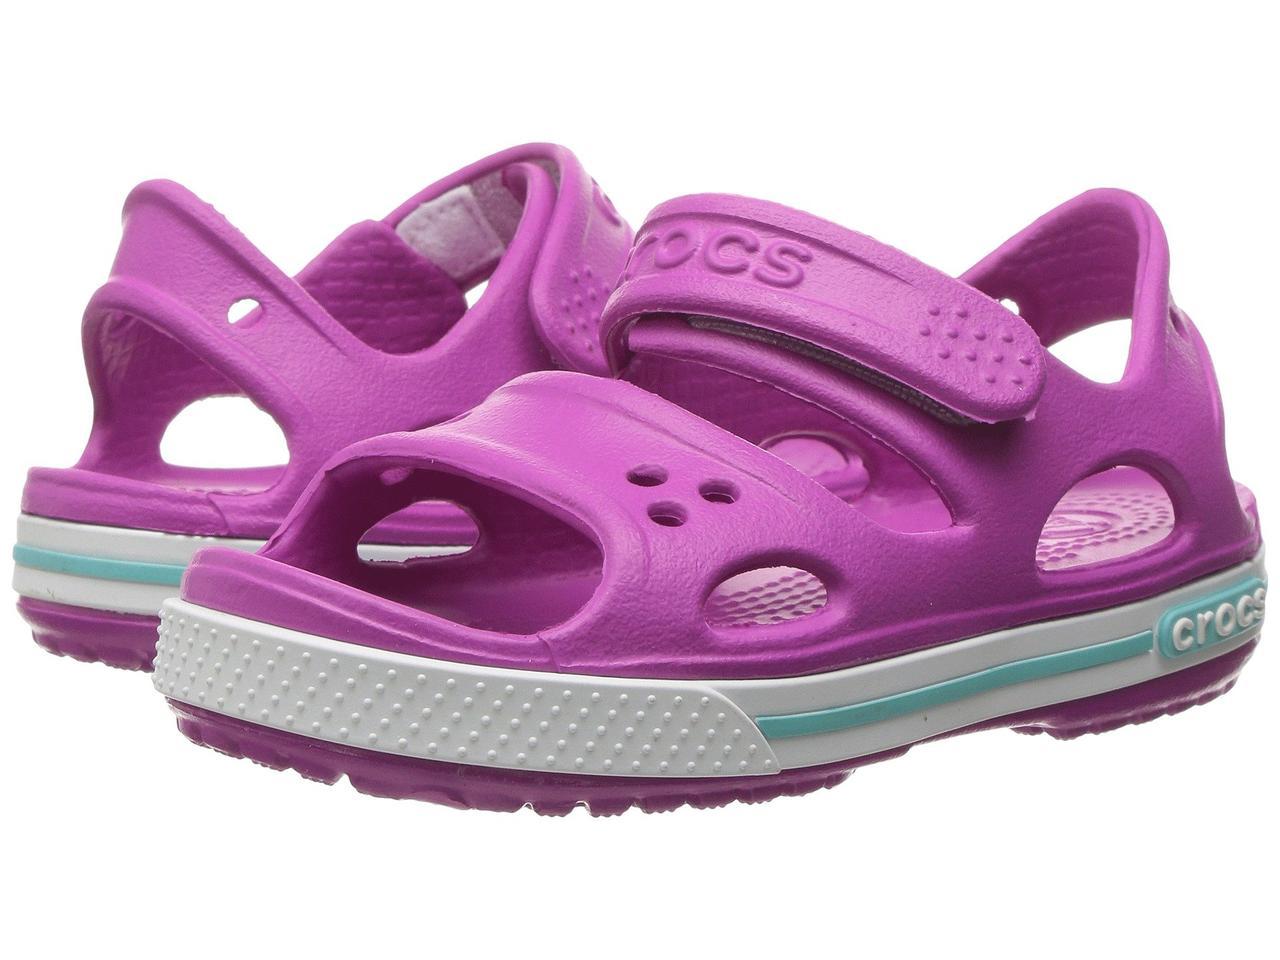 Босоножки Кроксы Крокбэнд 2 сандалии / Crocs Kids Crocband II Sandal